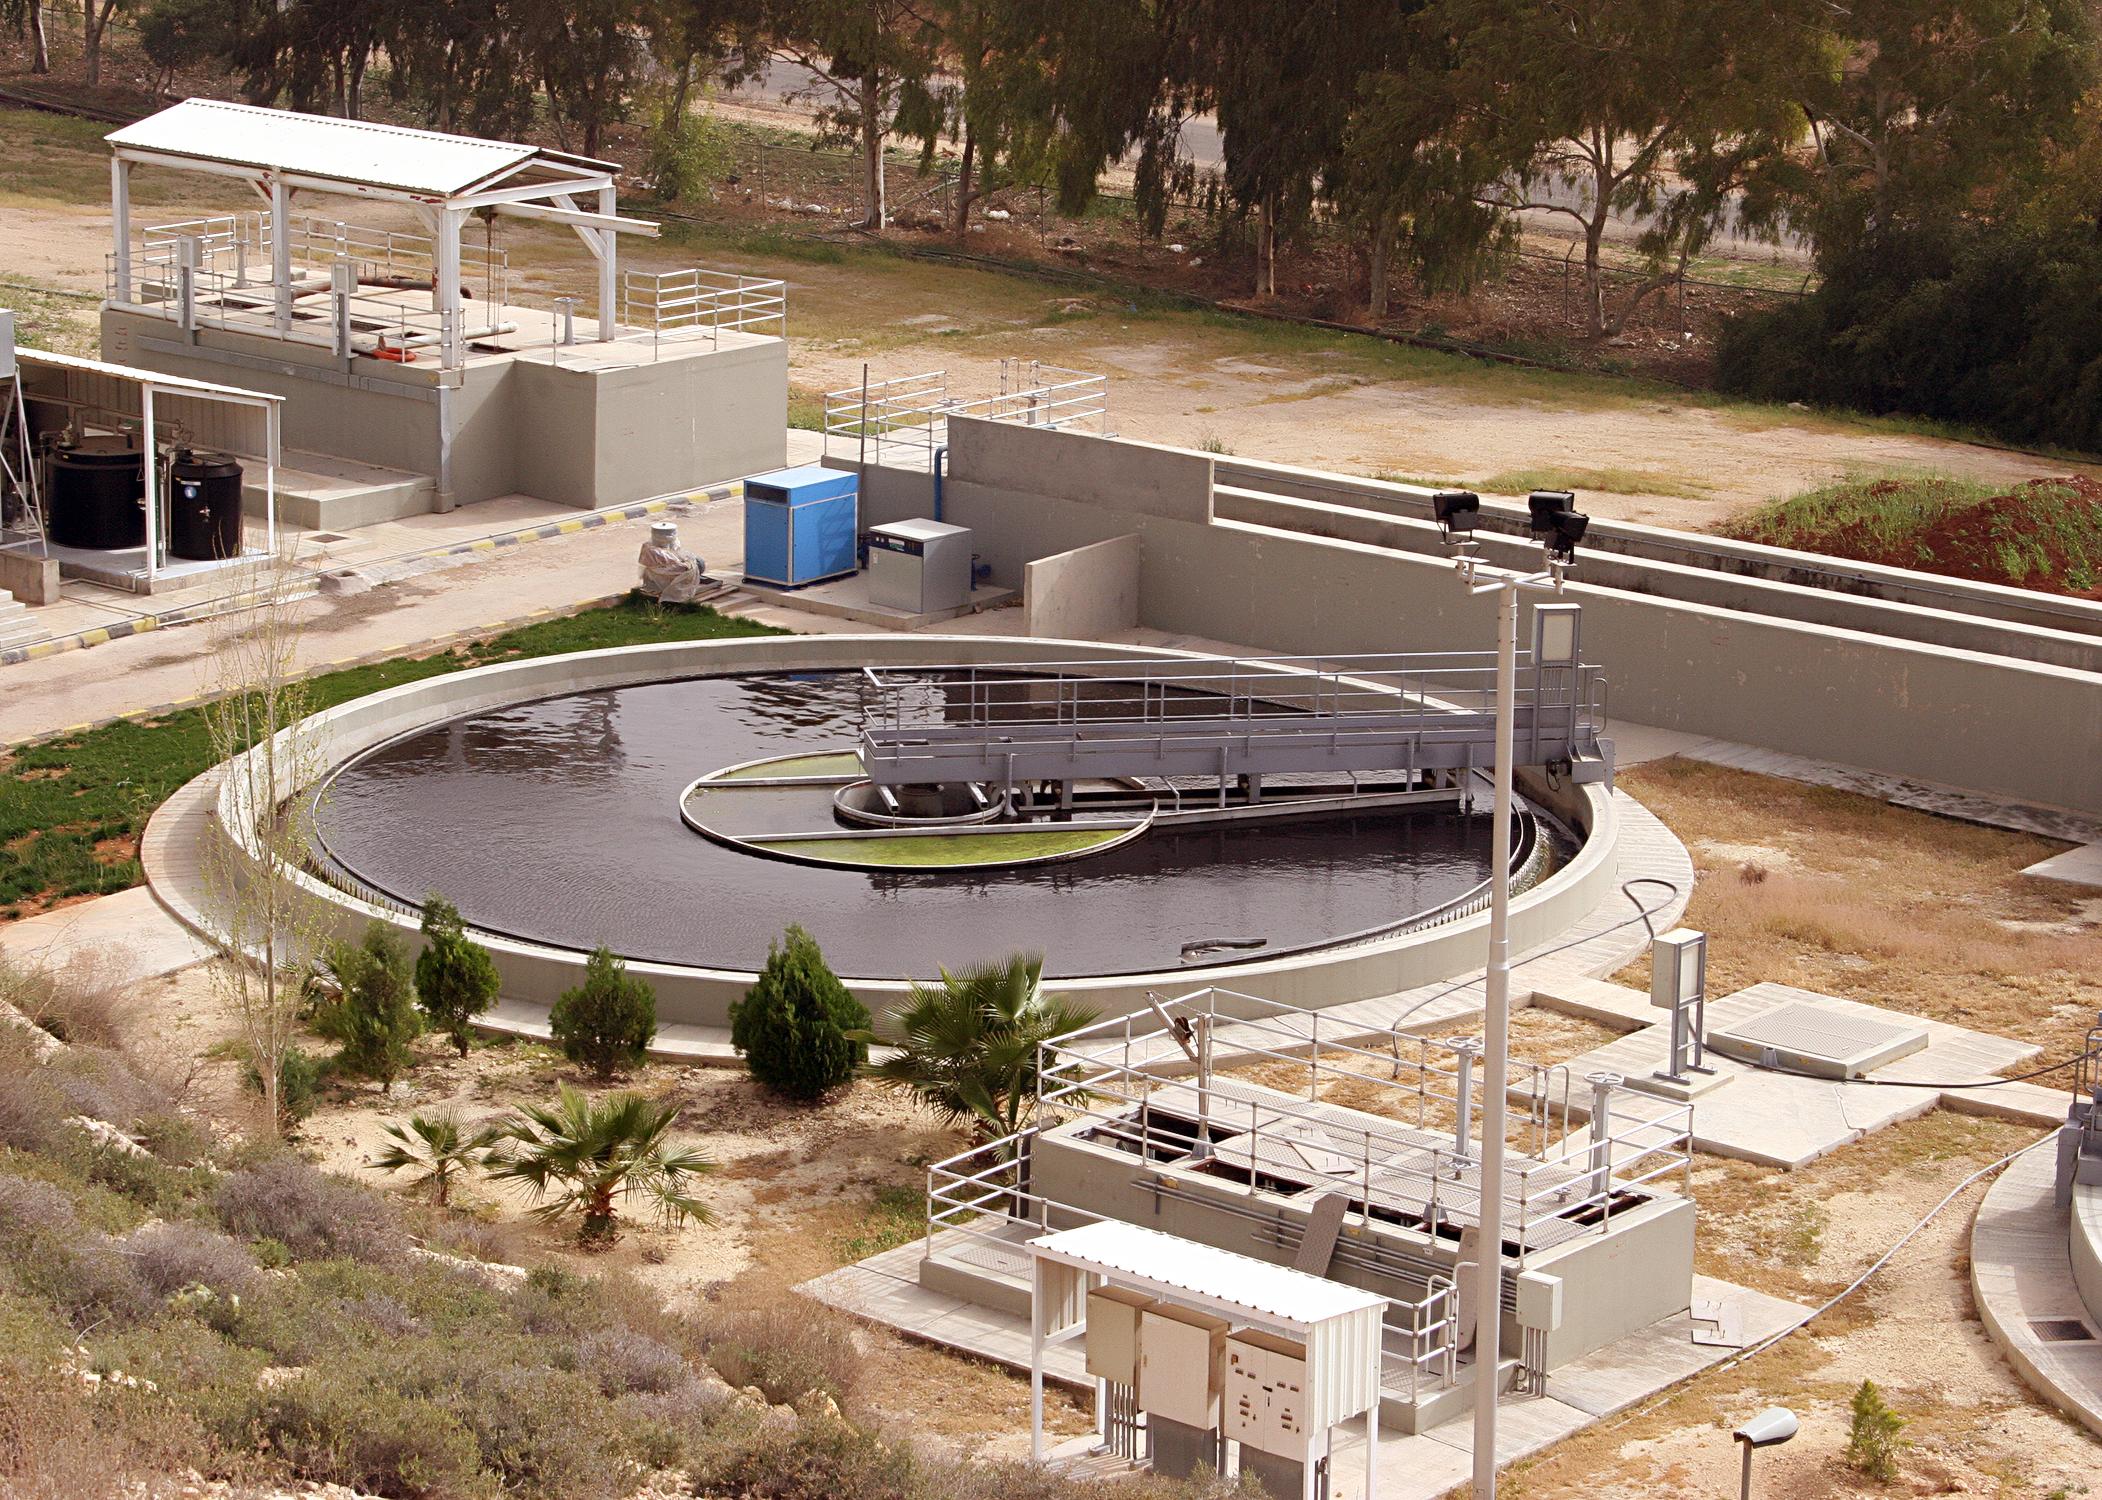 Baqa'a Sewage Treatment Plant